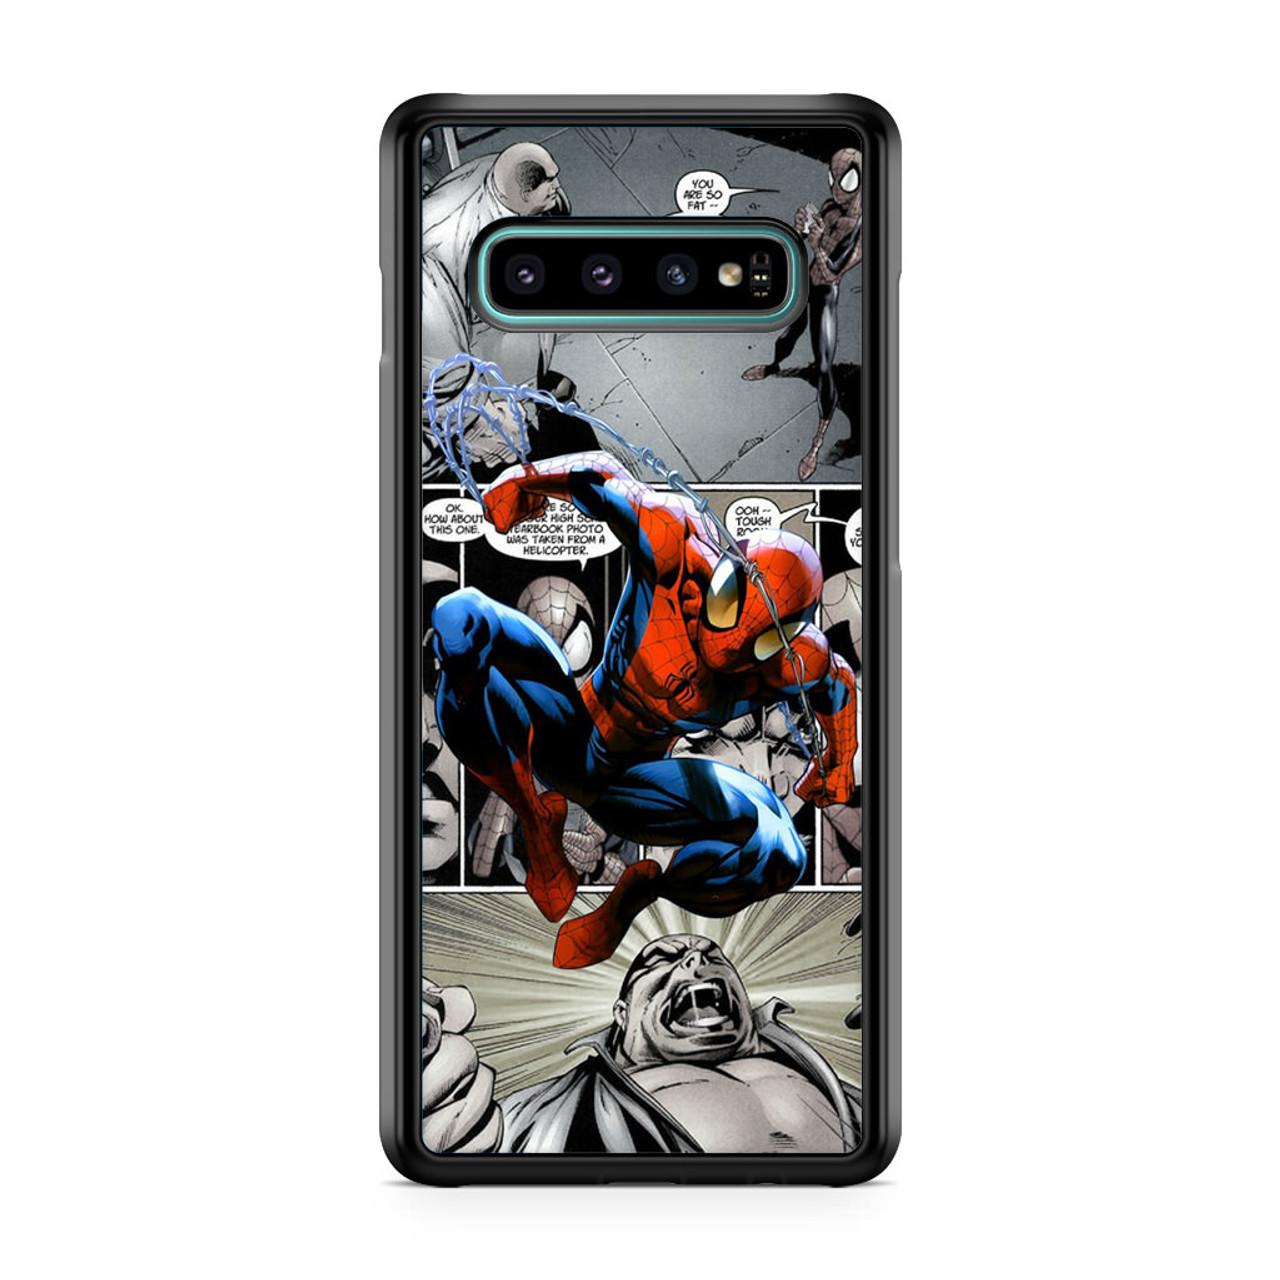 Spiderman Comics Wallpaper Samsung Galaxy S10 Case Caseshunter